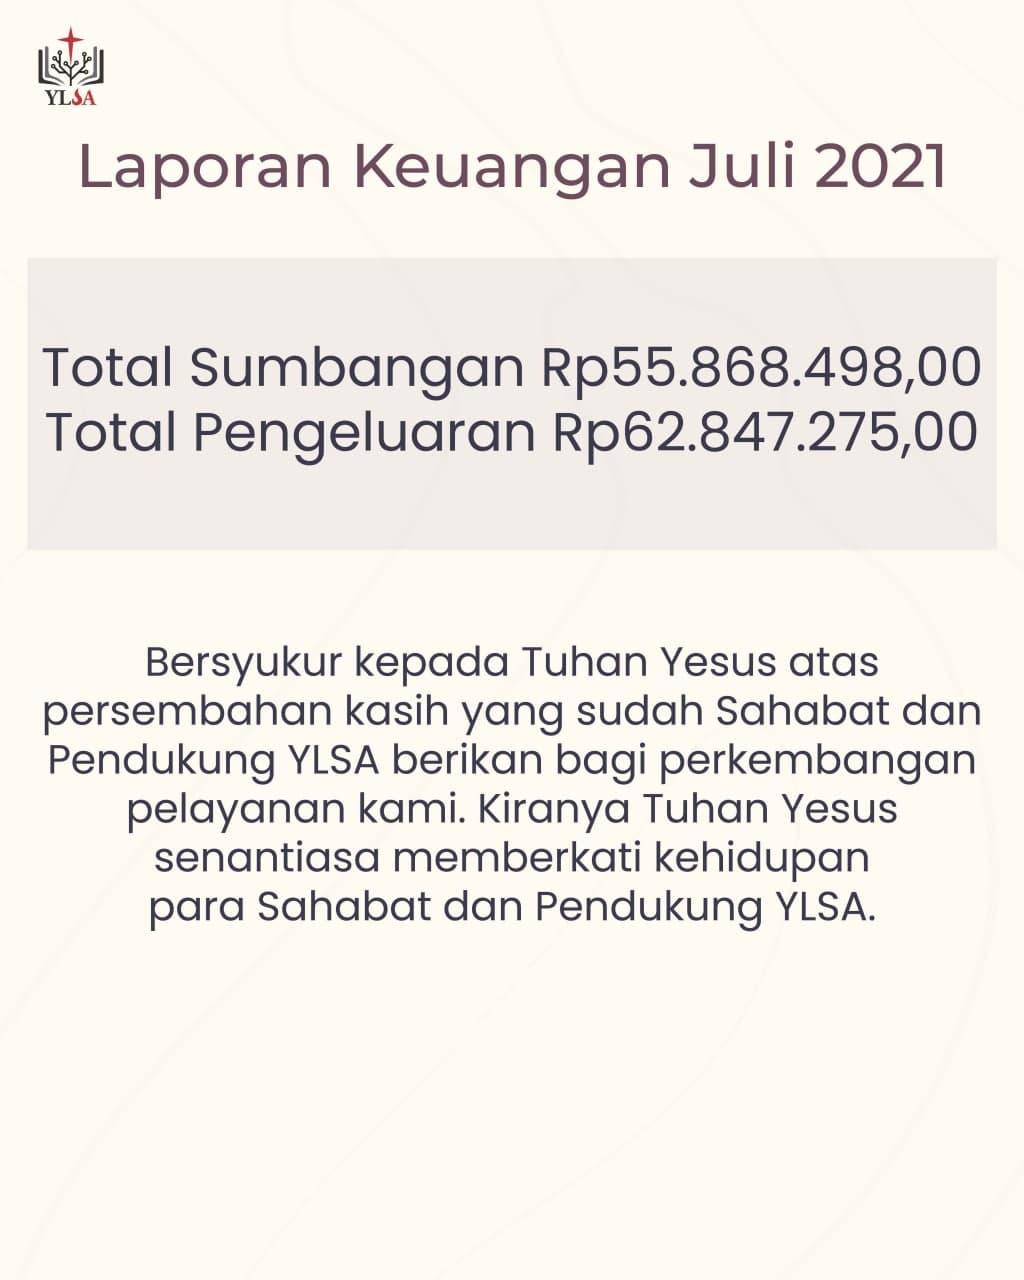 Laporan keuangan YLSA Juli 2021.